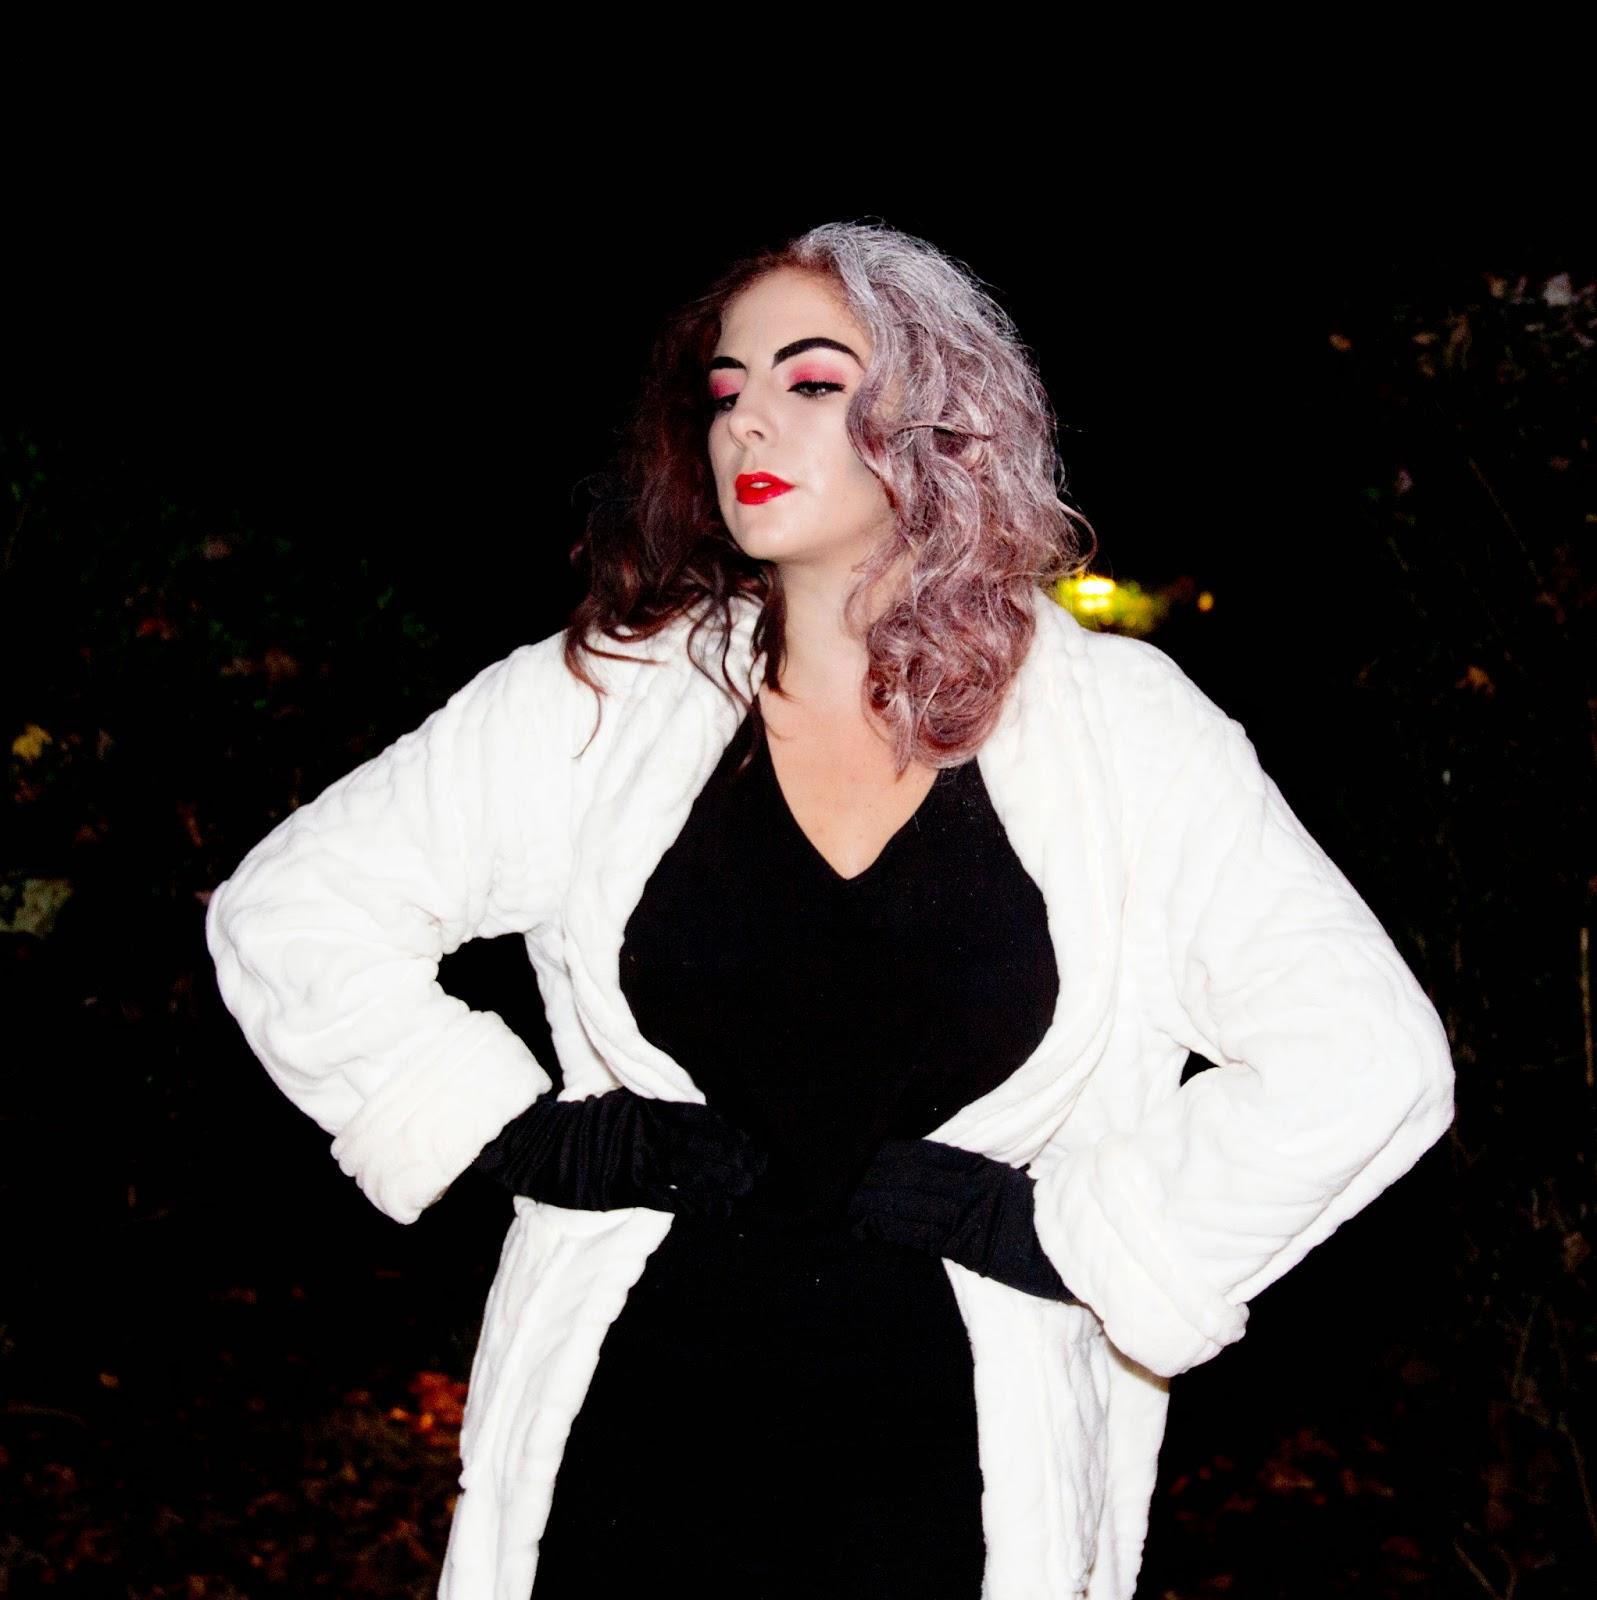 Lipstick chiffon october 2014 halloween makeup tutorial cruella de ville costume solutioingenieria Images